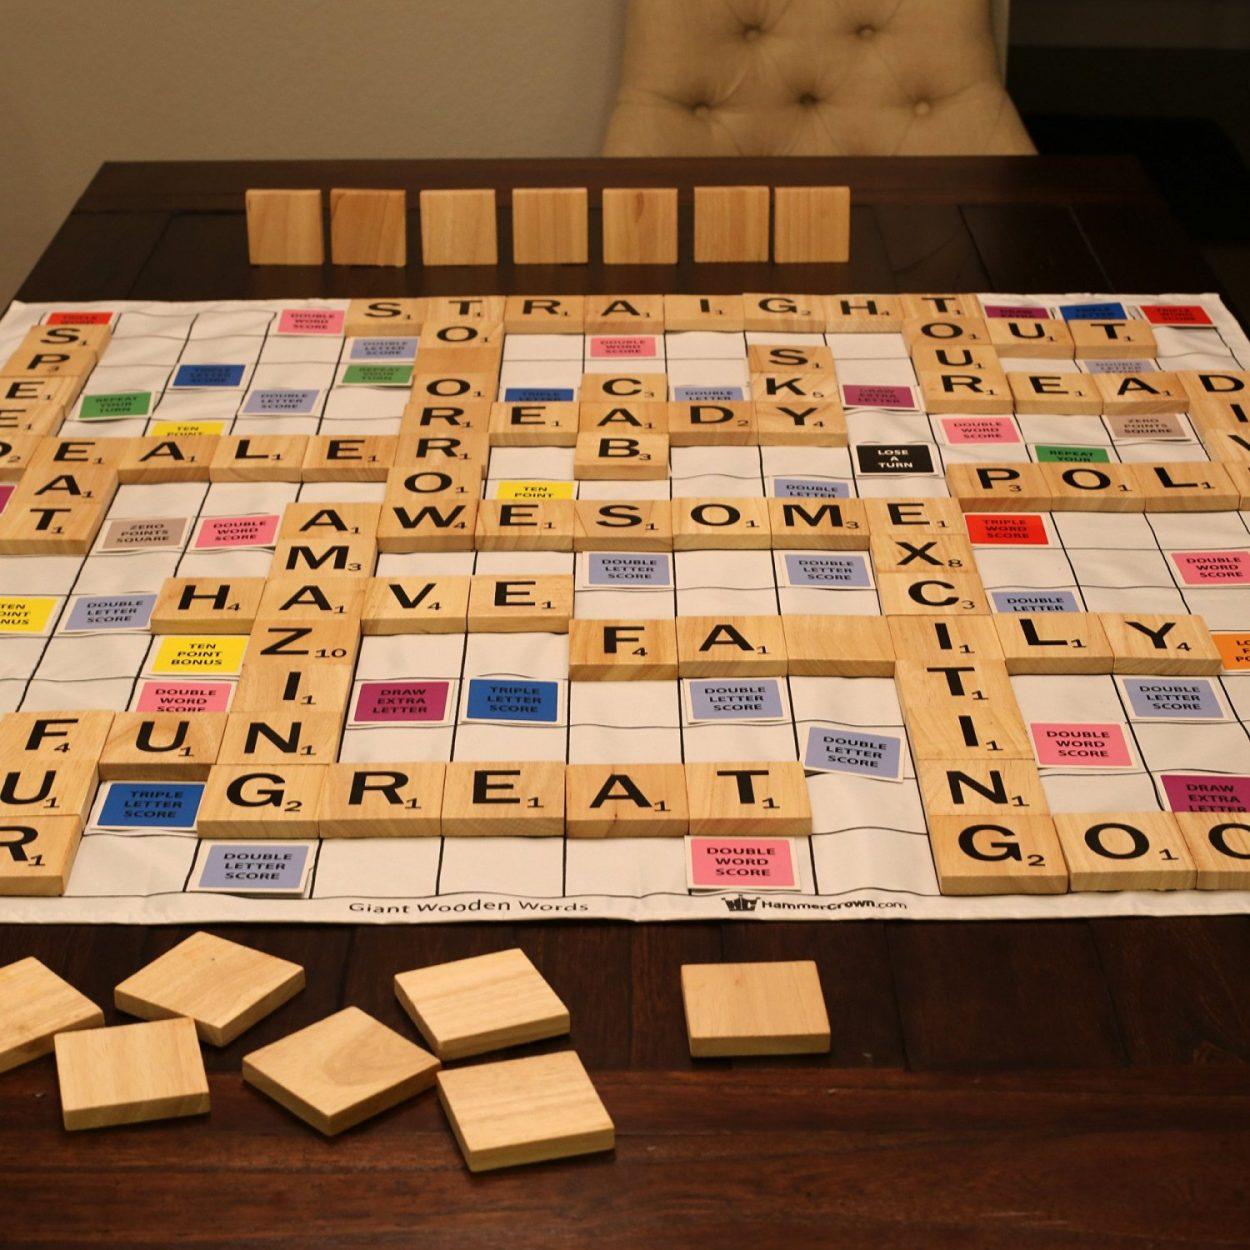 Scrabble Online Free - Scrabble Sprint